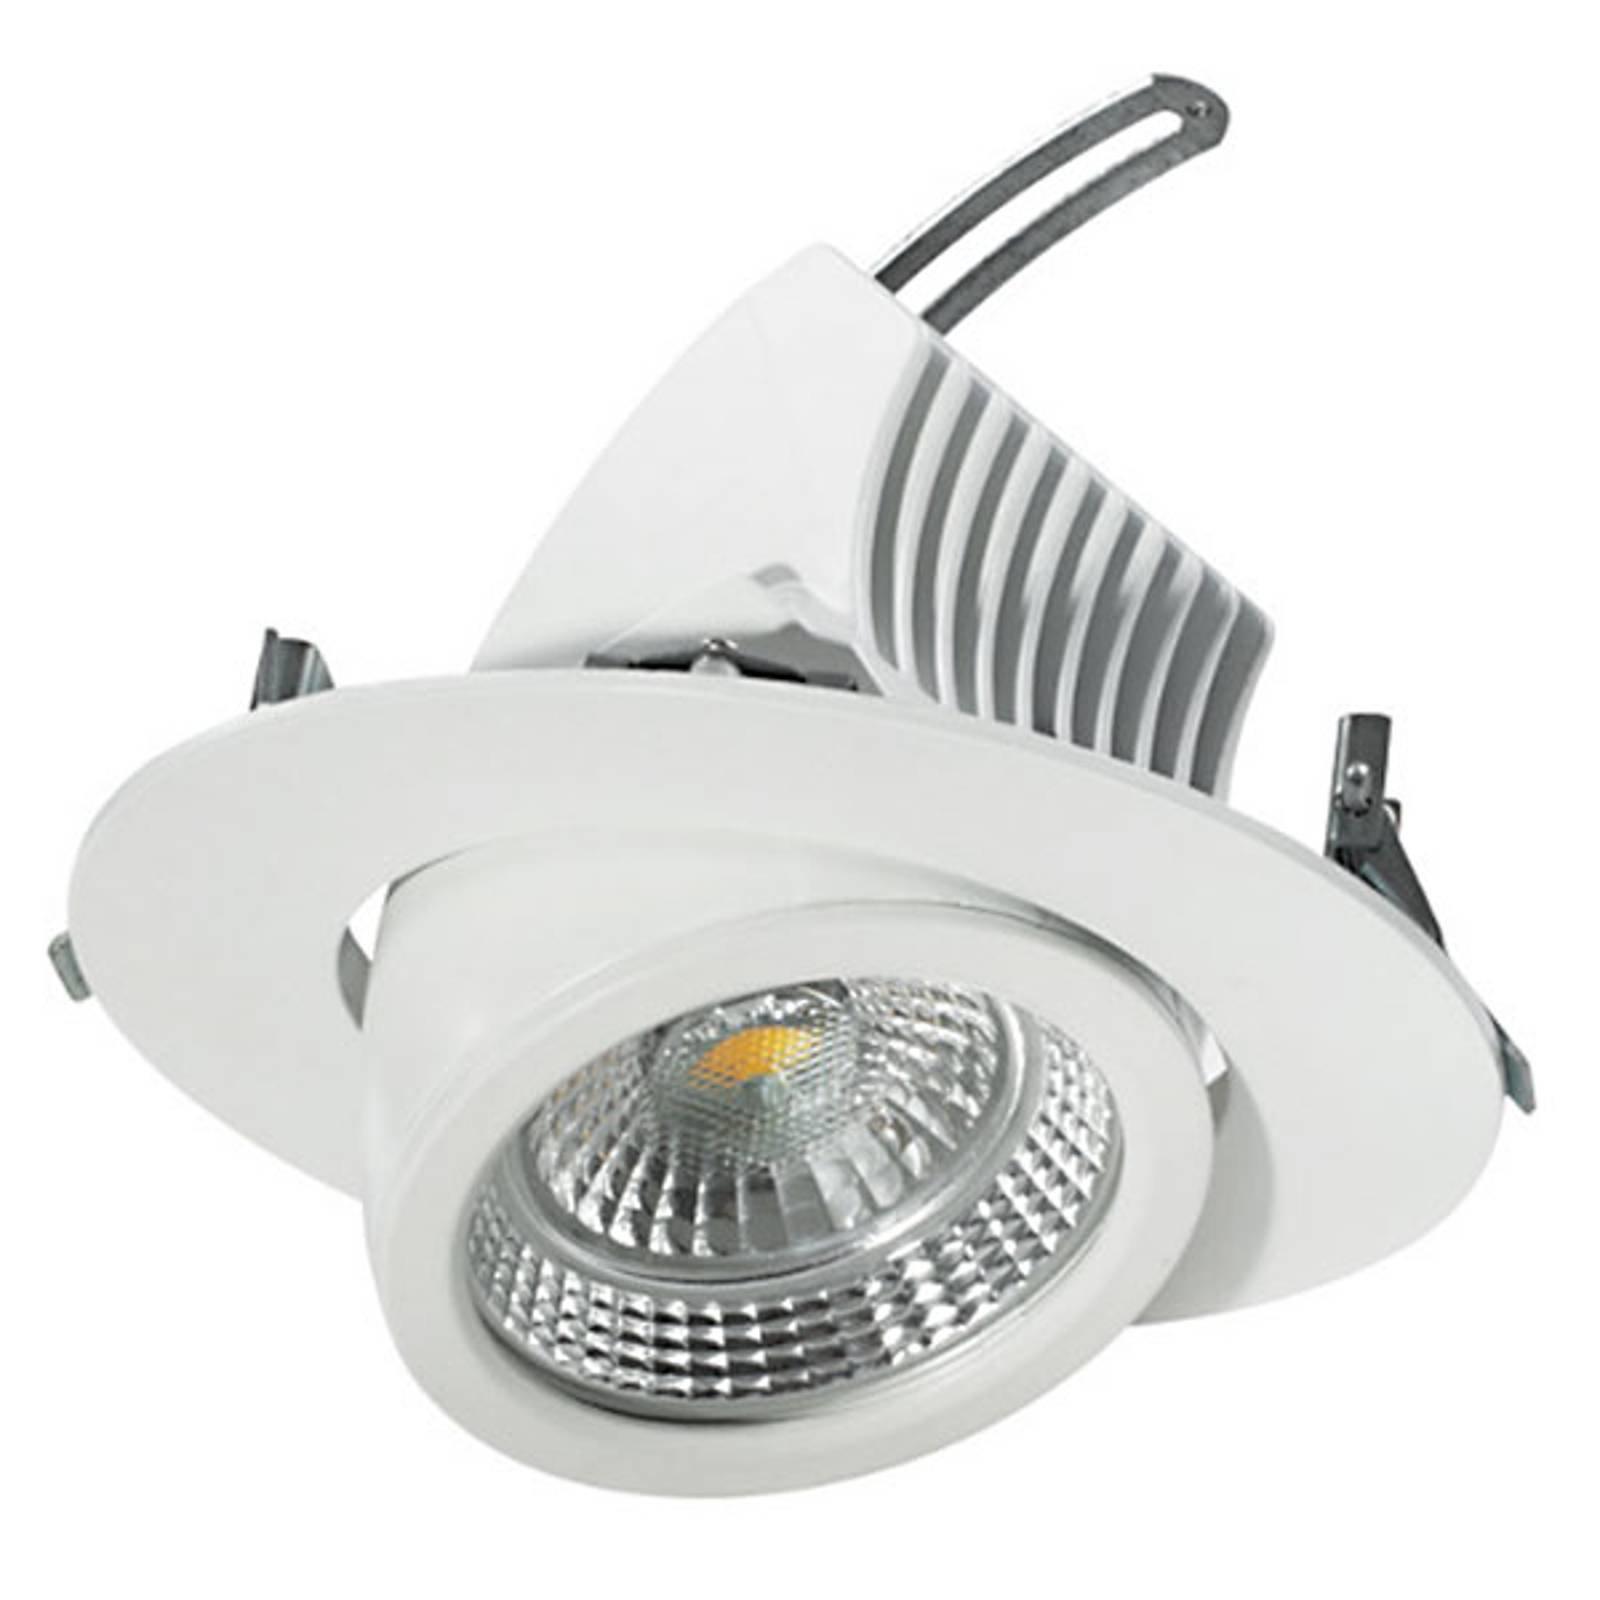 Svingbar LED-downlight 20 cm, 48 W